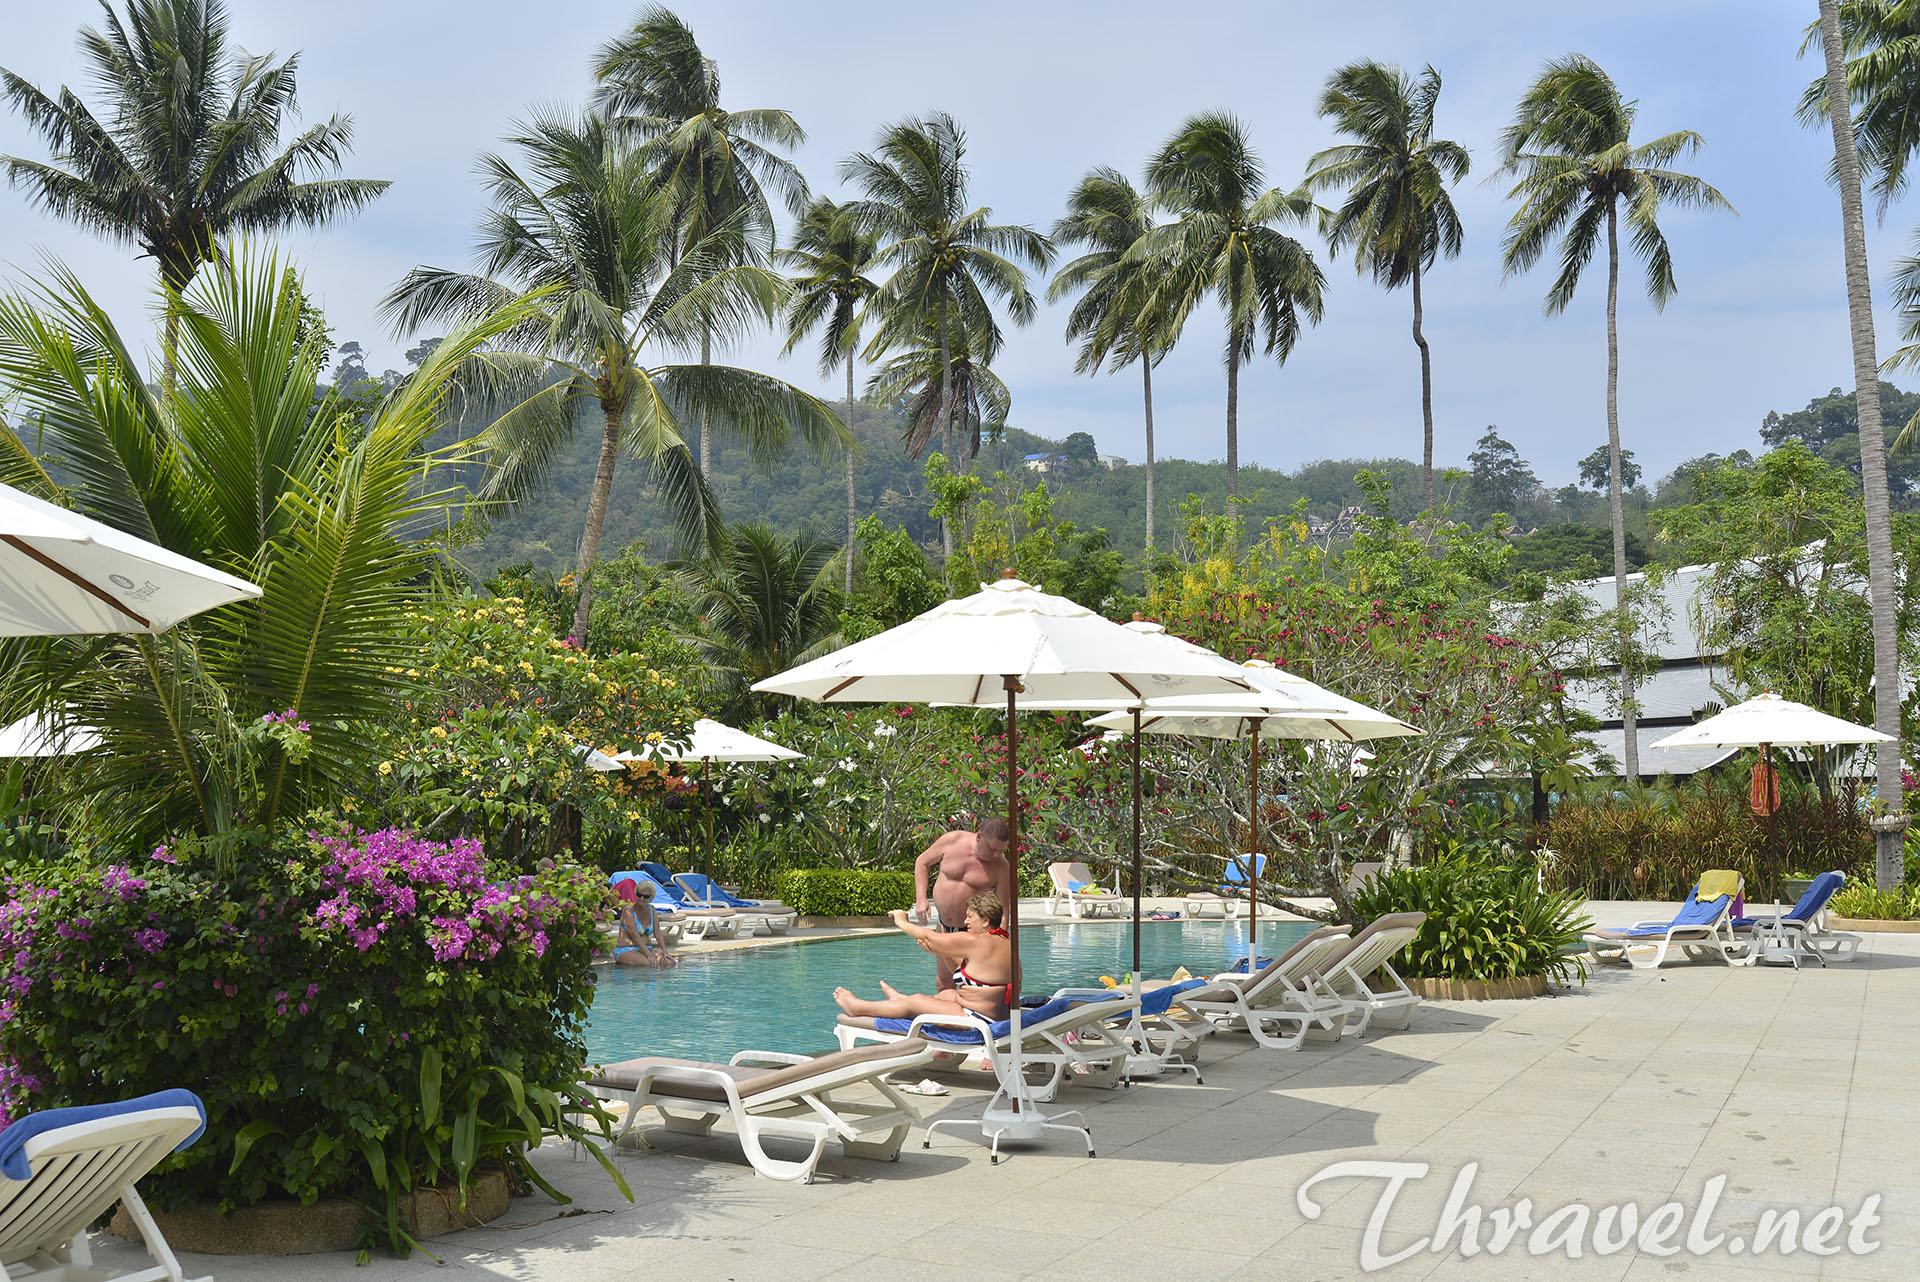 duangjitt-resort-and-spa-hotel-patong-beach-phuket-thailand-34